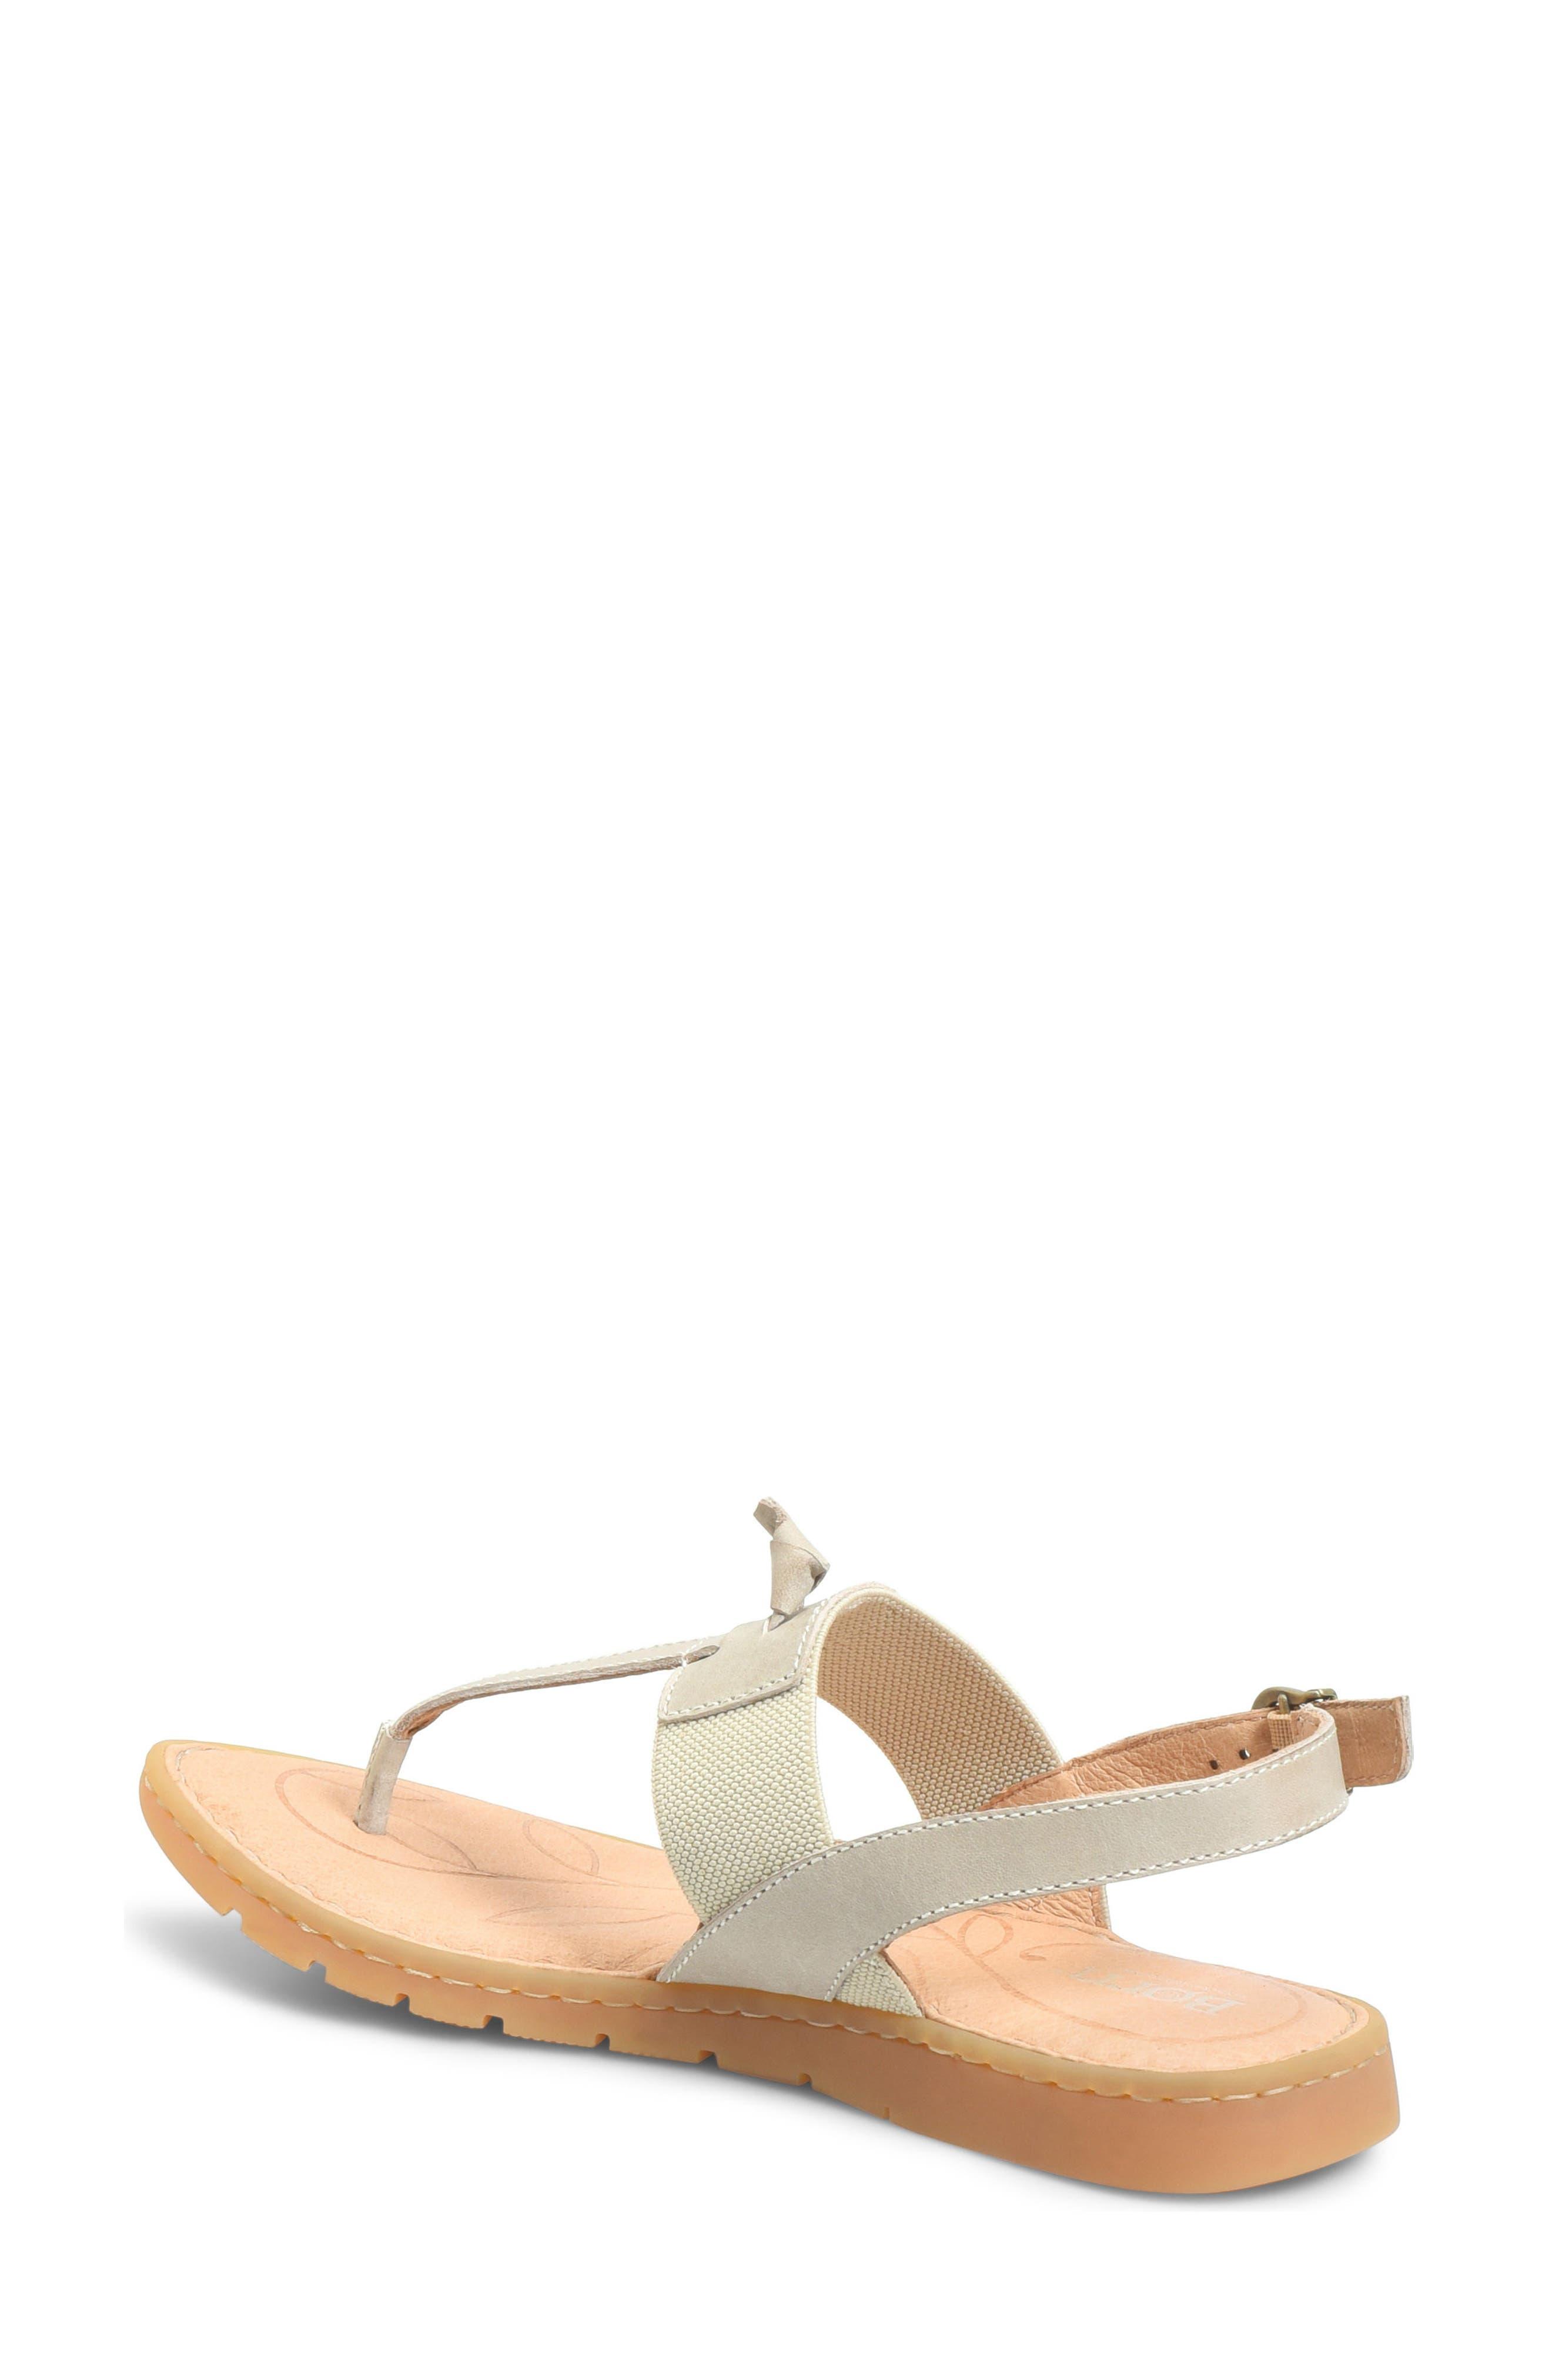 Siri Sandal,                             Alternate thumbnail 2, color,                             Cream Leather